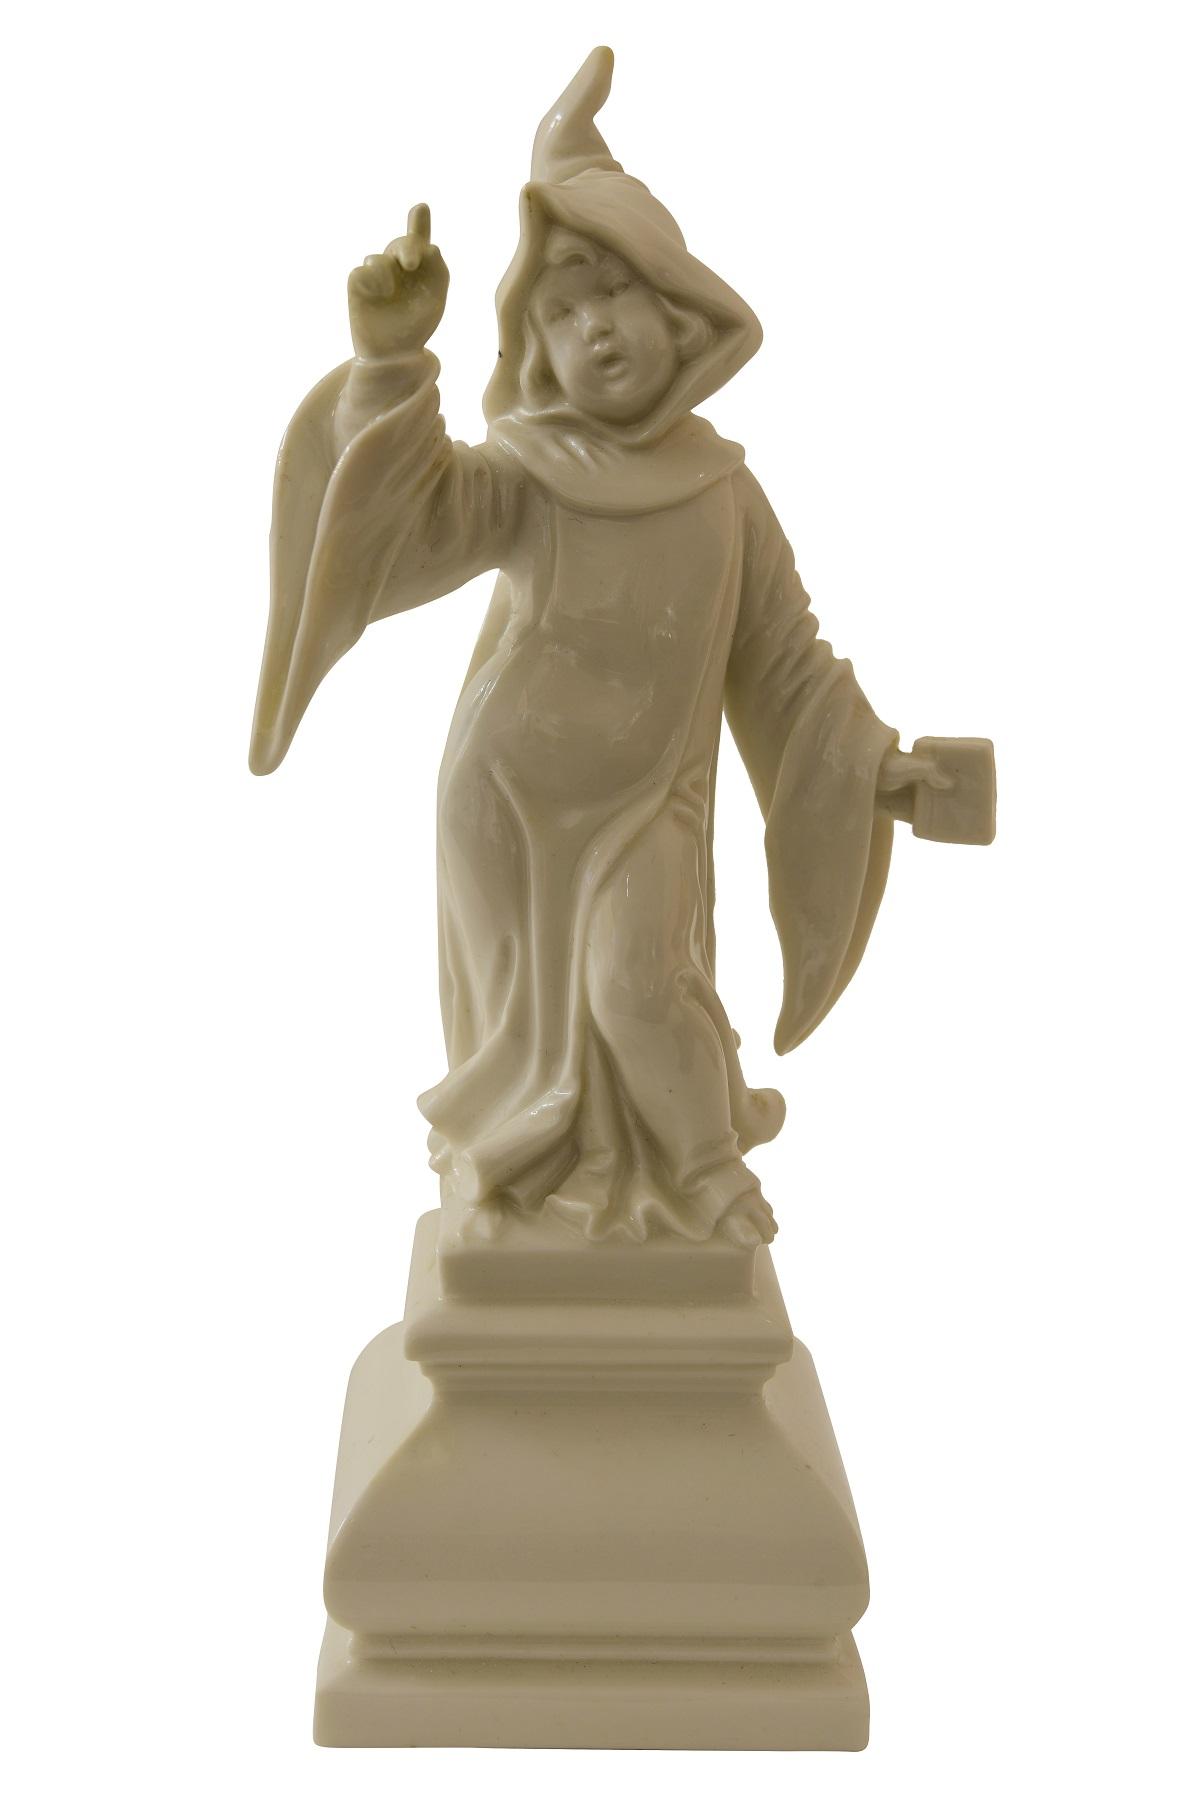 #160 Munich Kindl porcelain manufacturer Allach, Munich | Münchnerkindl Porzellanmanufaktur Allach, München Image